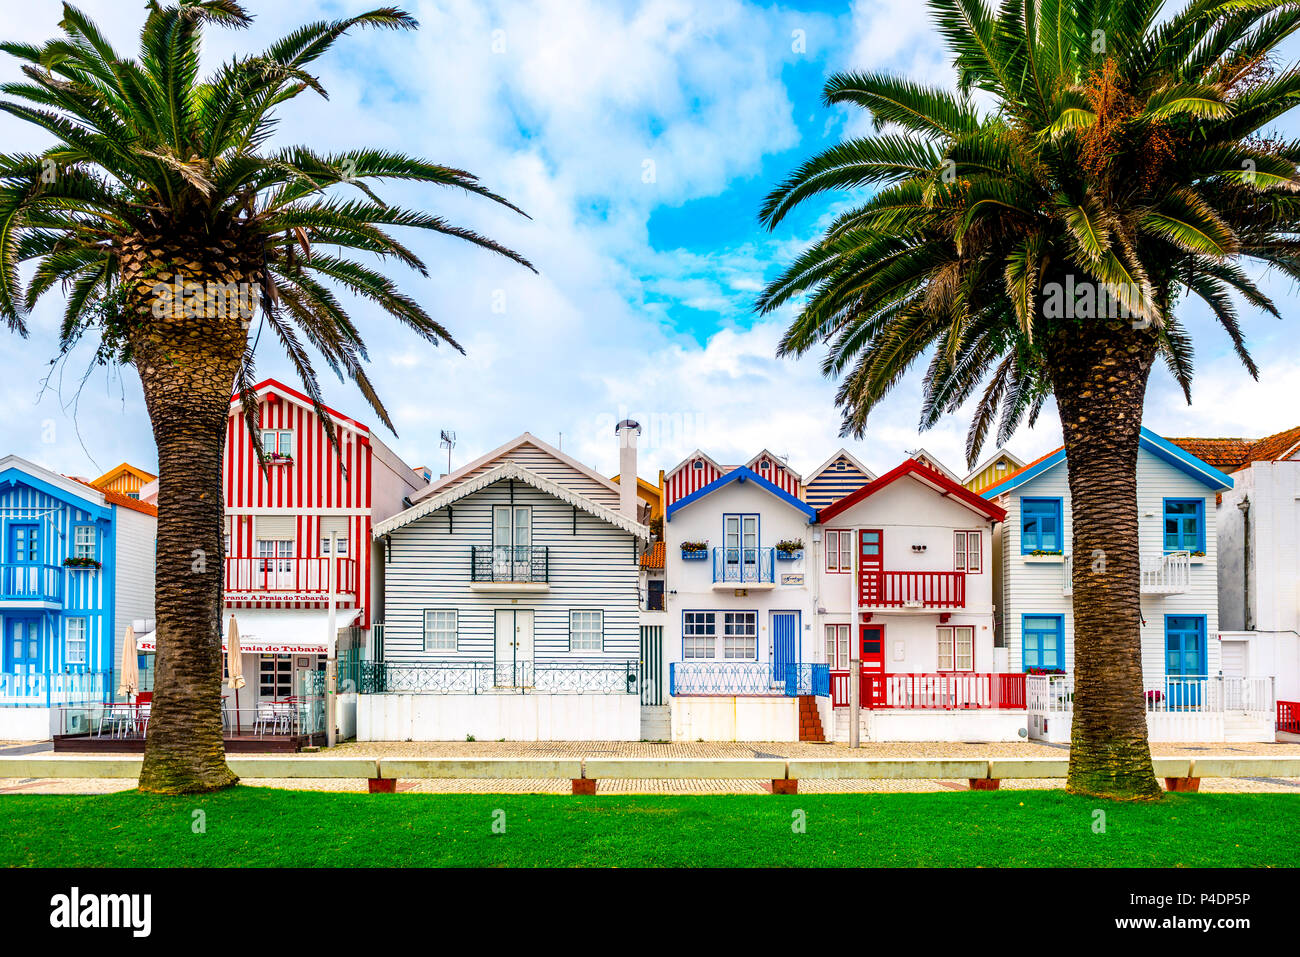 Europa, Portugal, Aveiro, Costa Nova, bunt, Häuser Stockbild